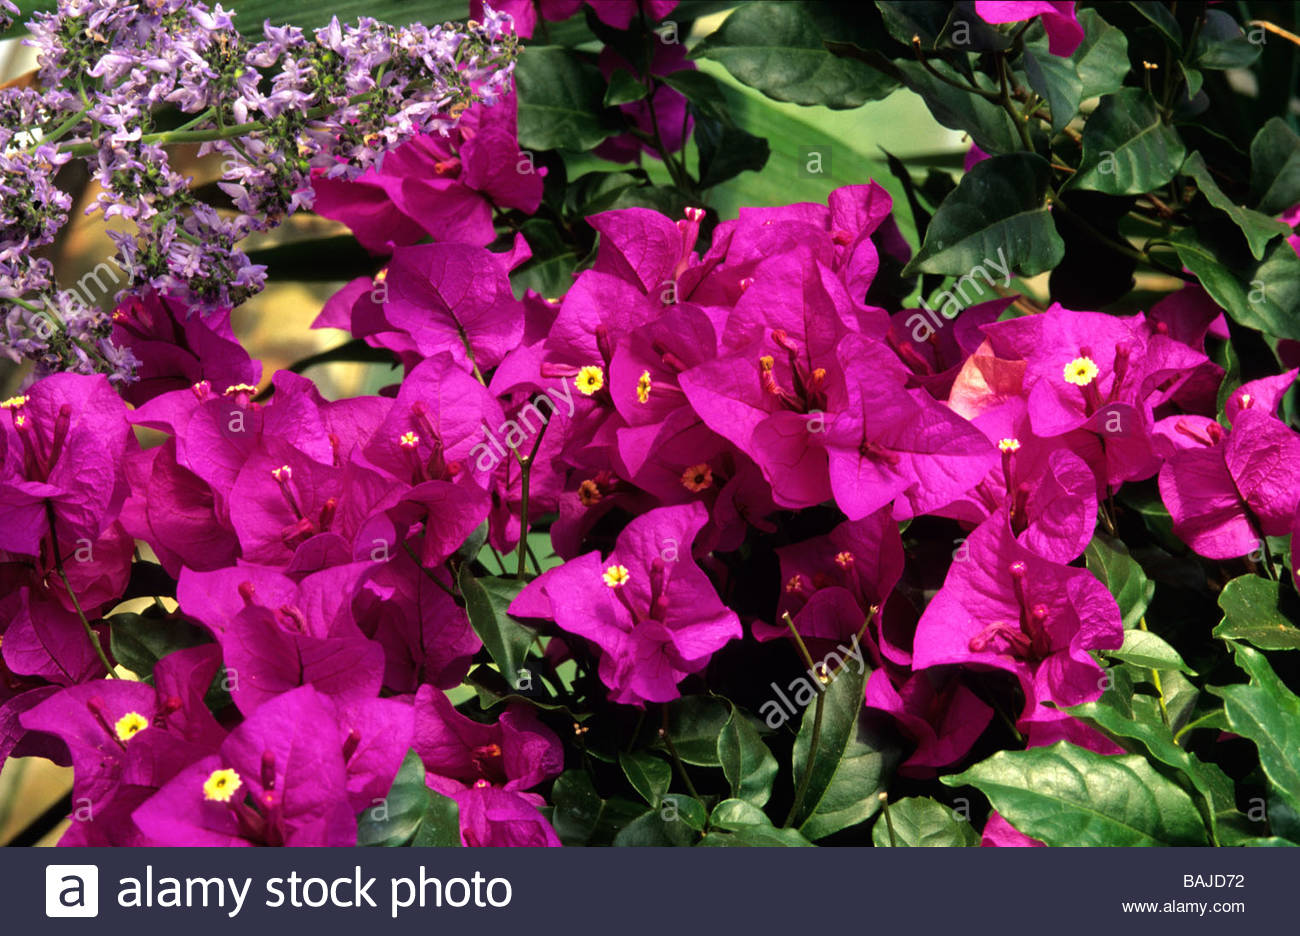 Purple Robe Stock Photos & Purple Robe Stock Images - Alamy